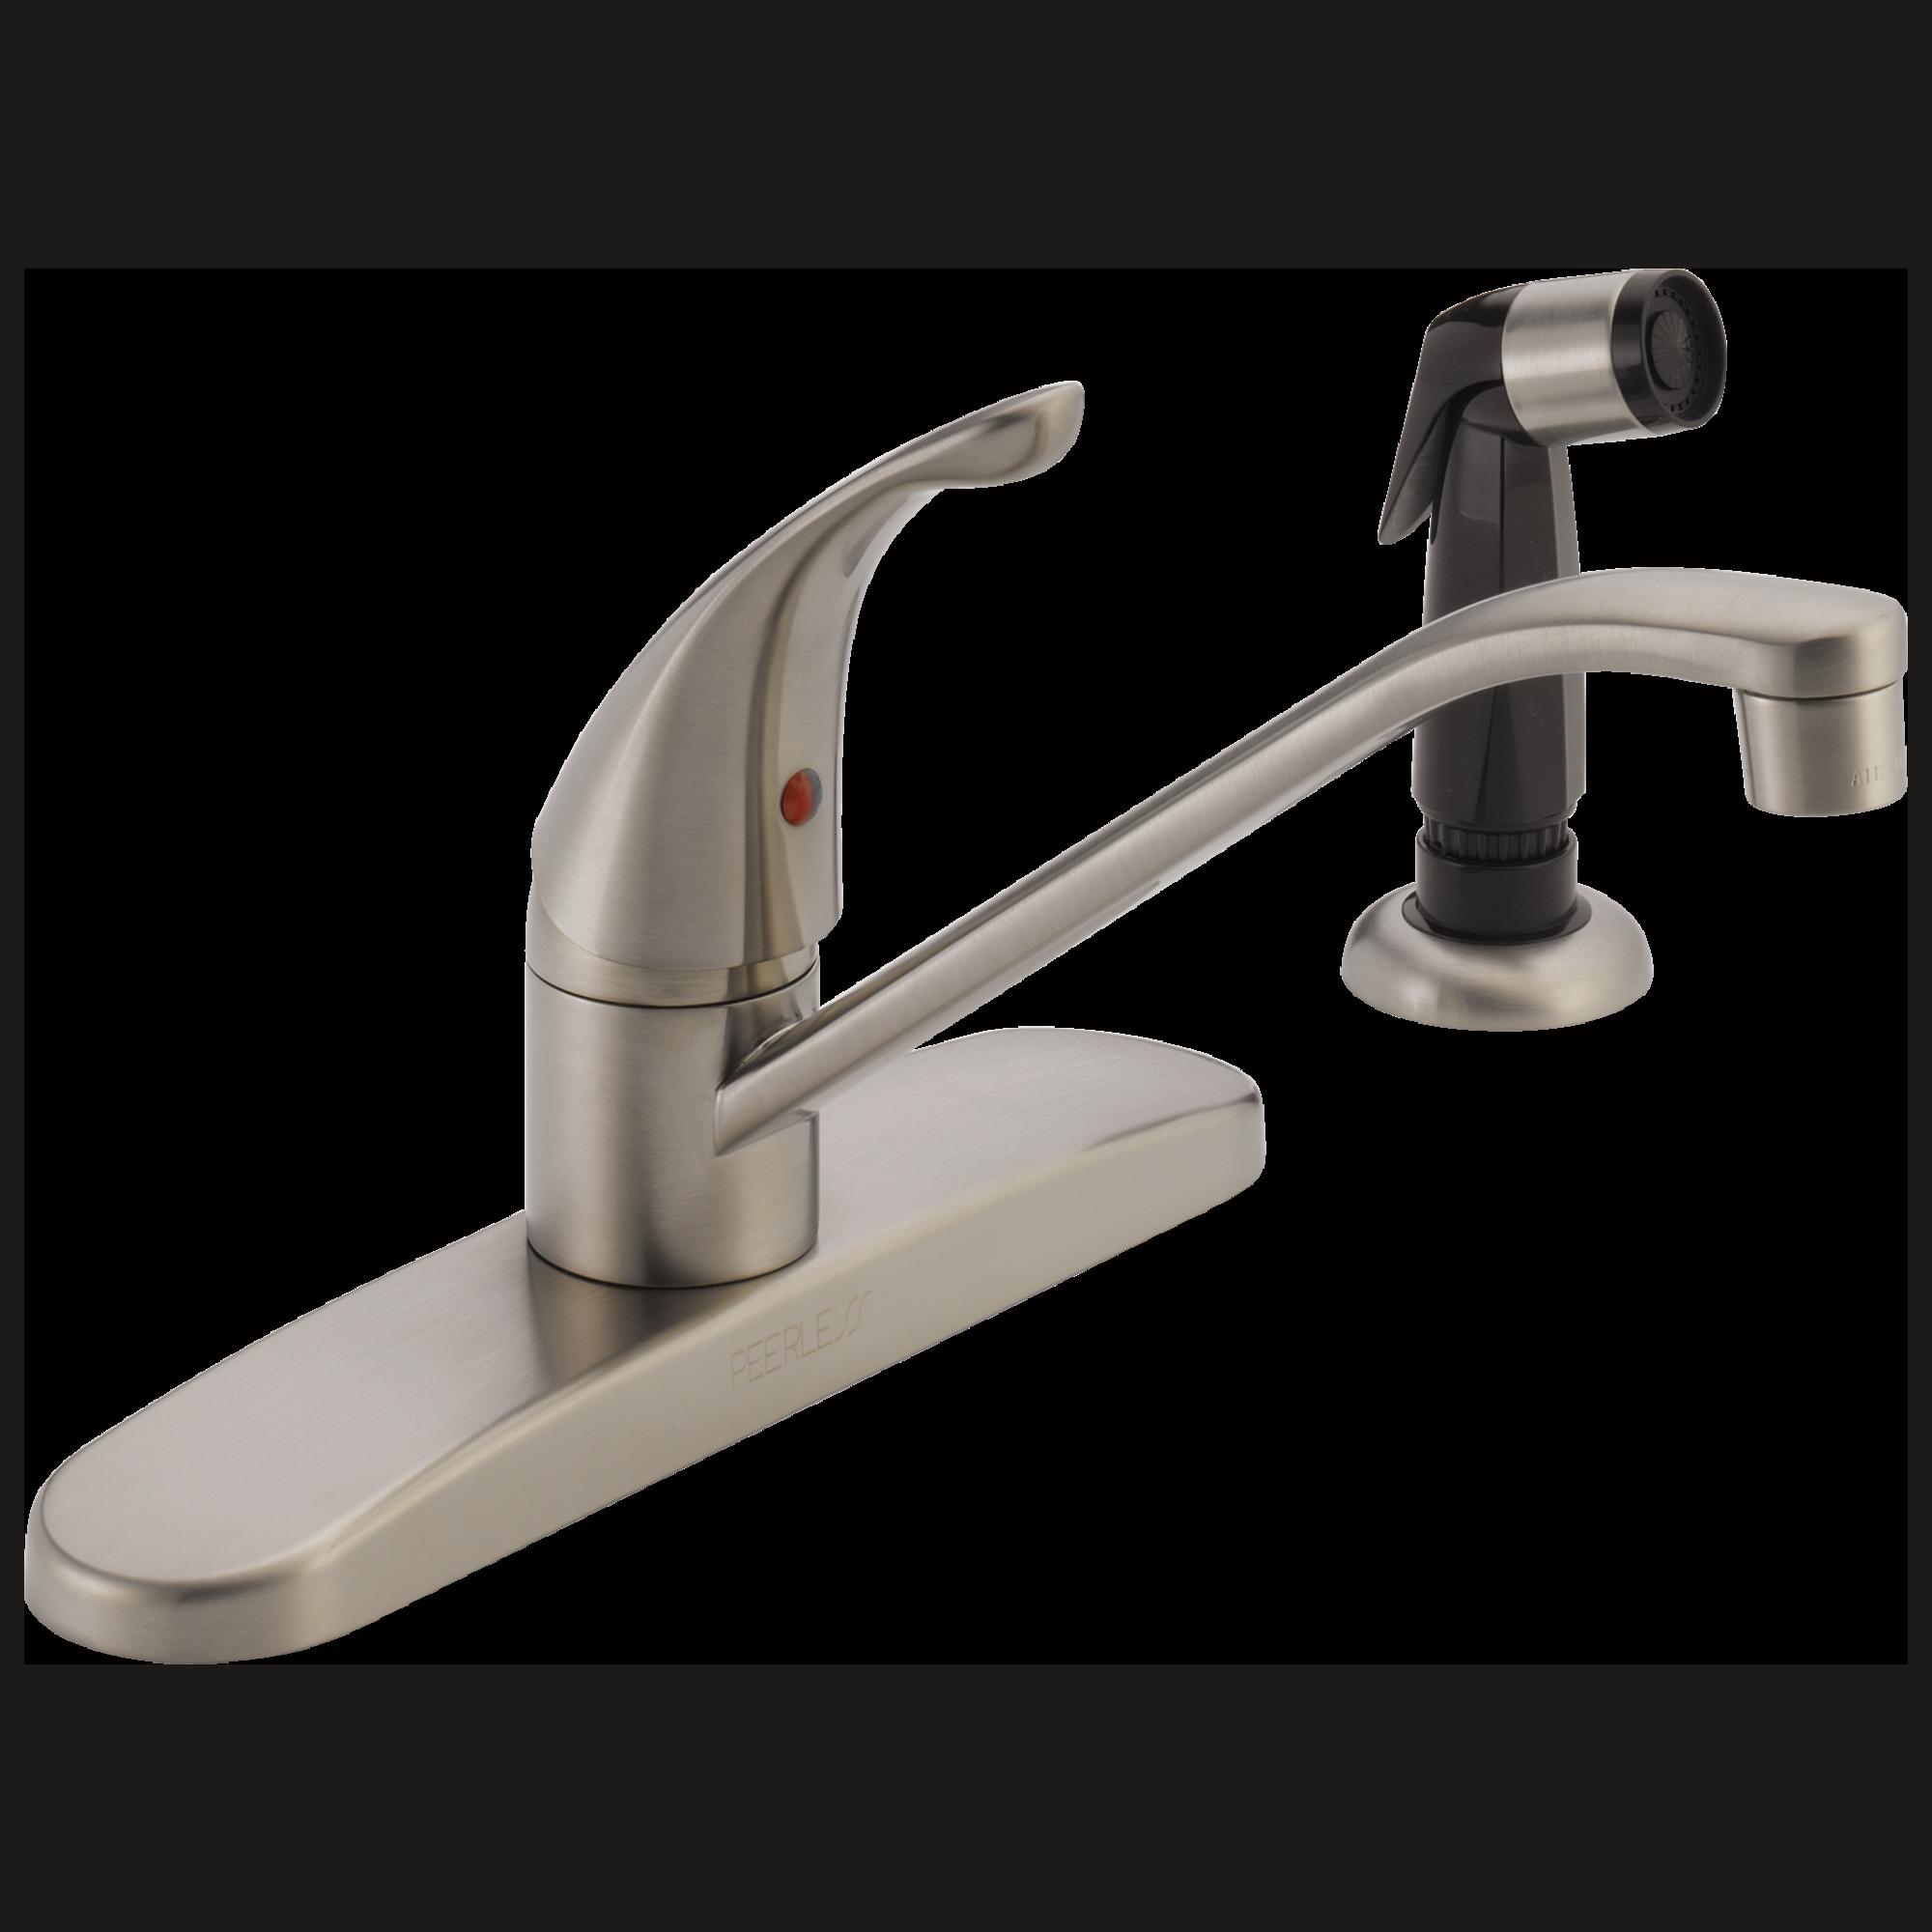 peerless p115lf ss classic  single handle kitchen faucet